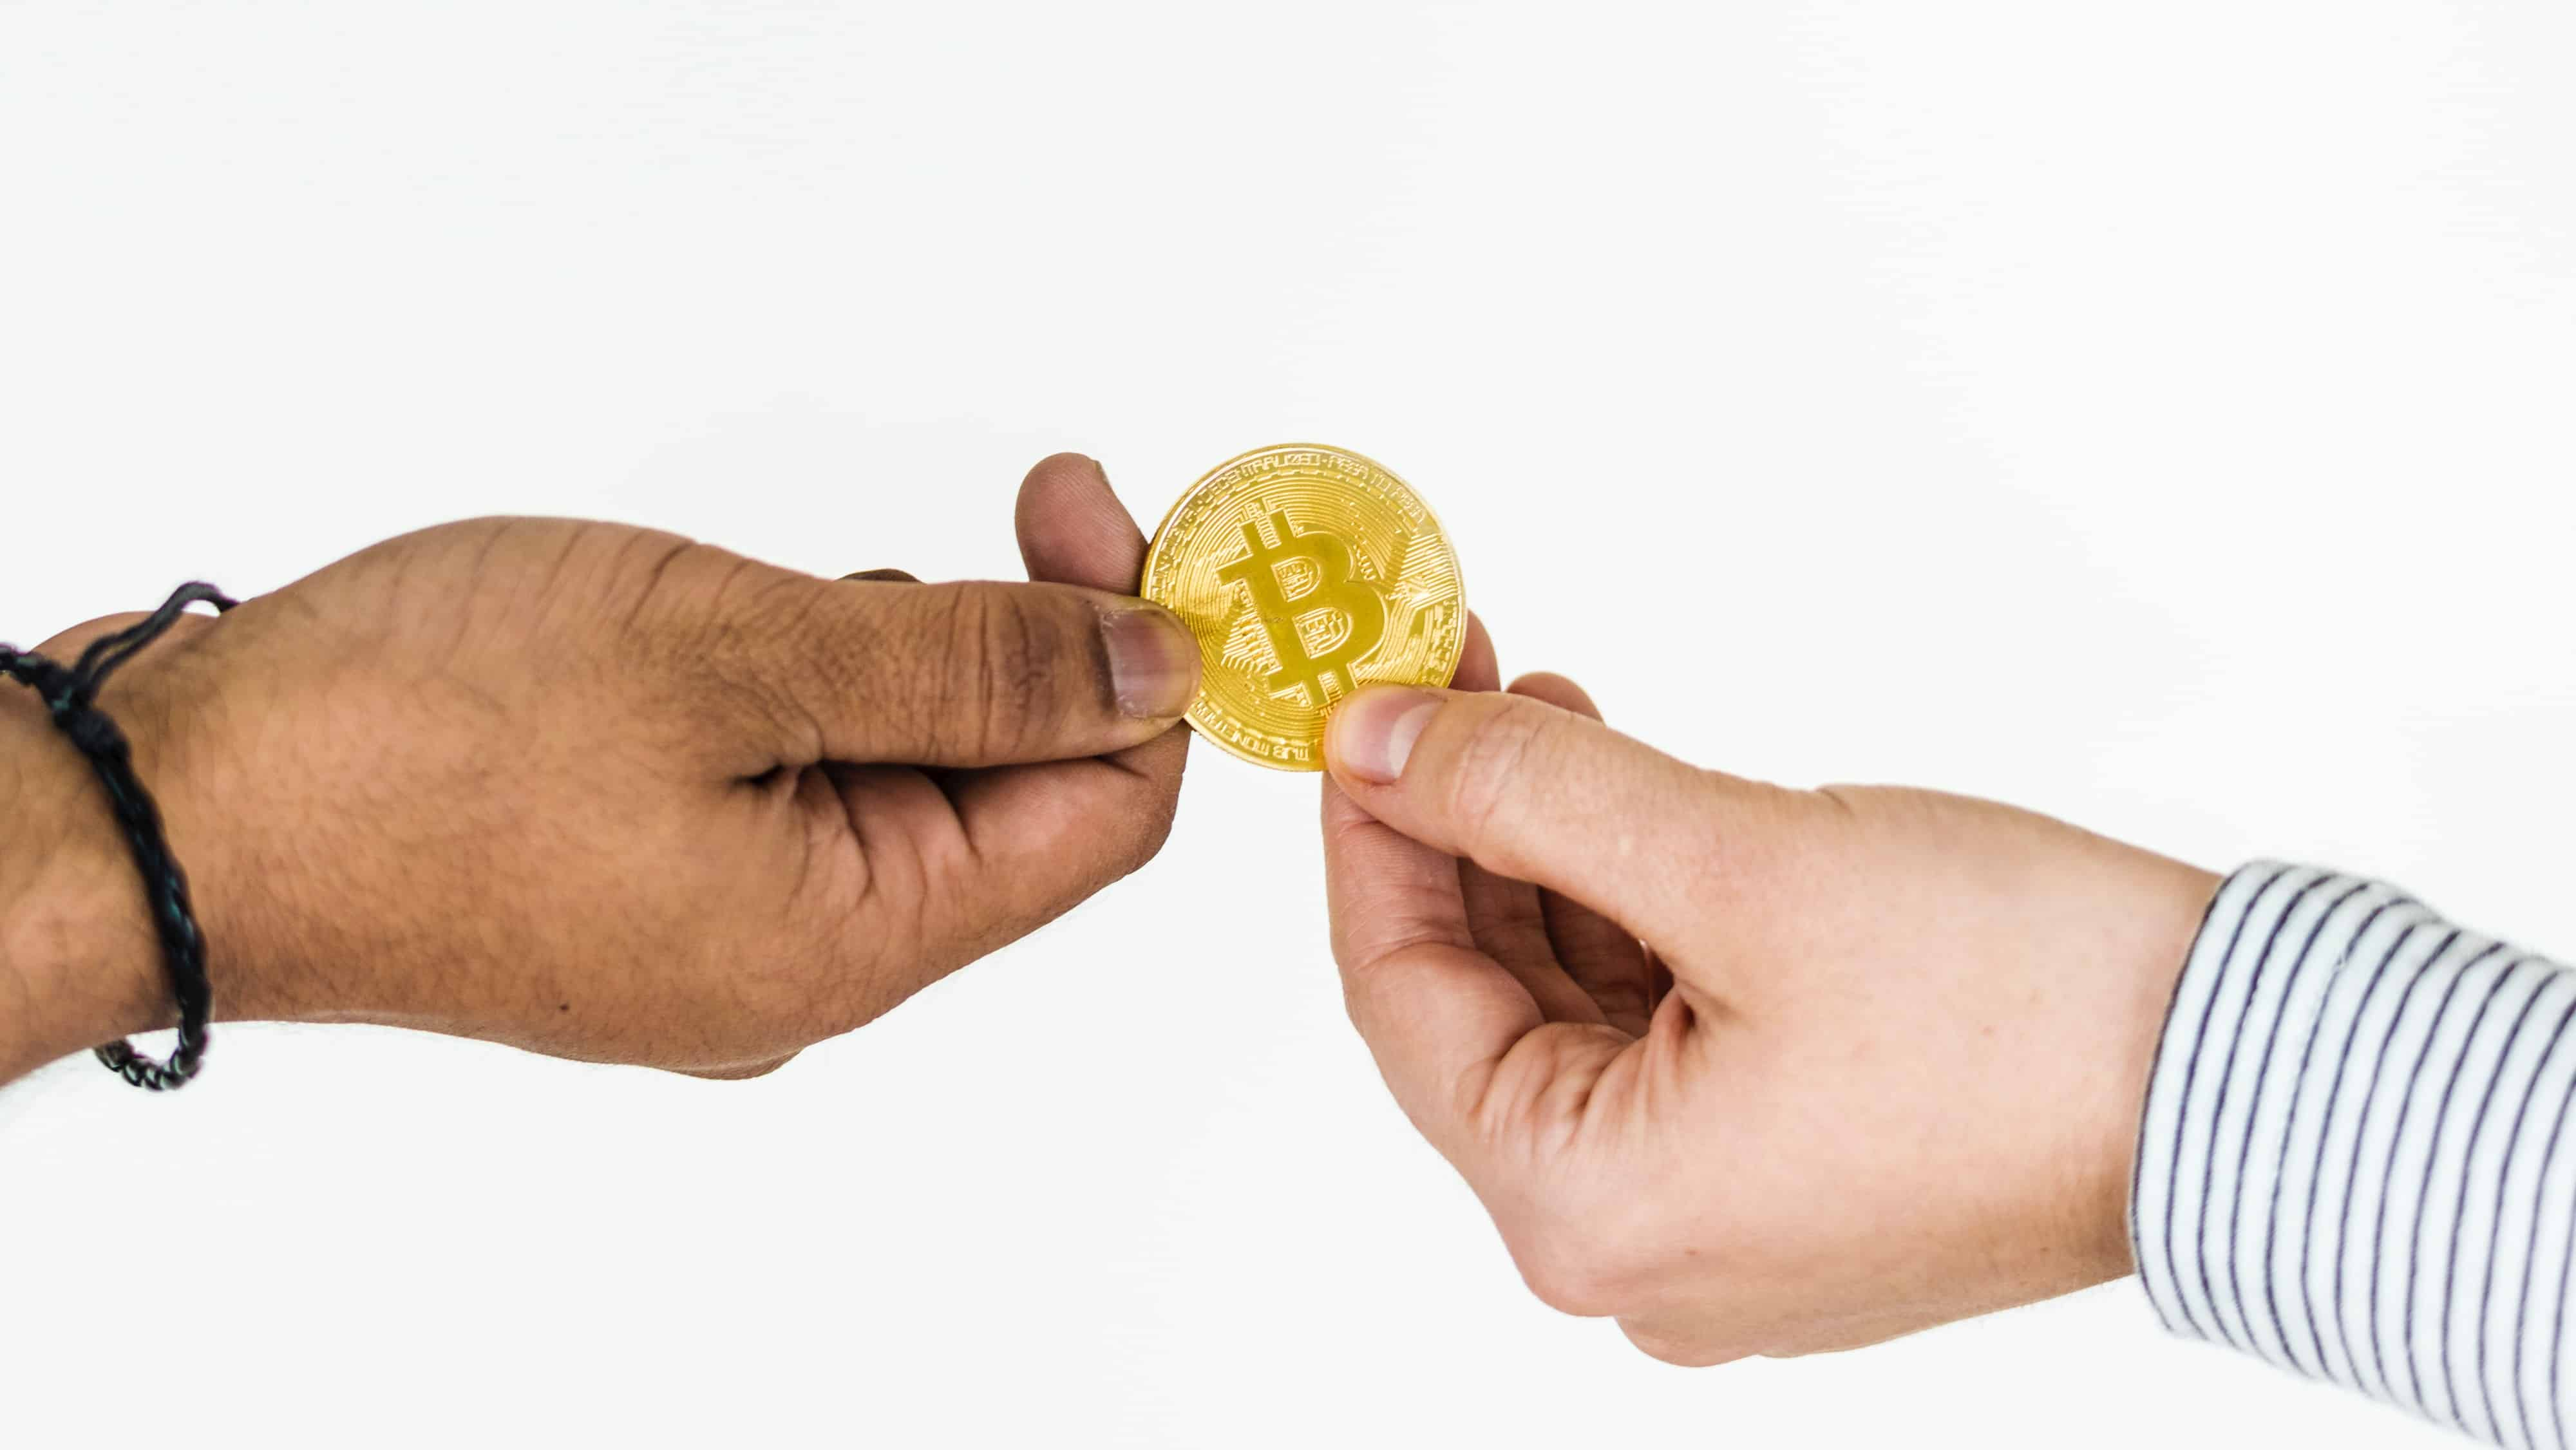 Münzen Erhalten